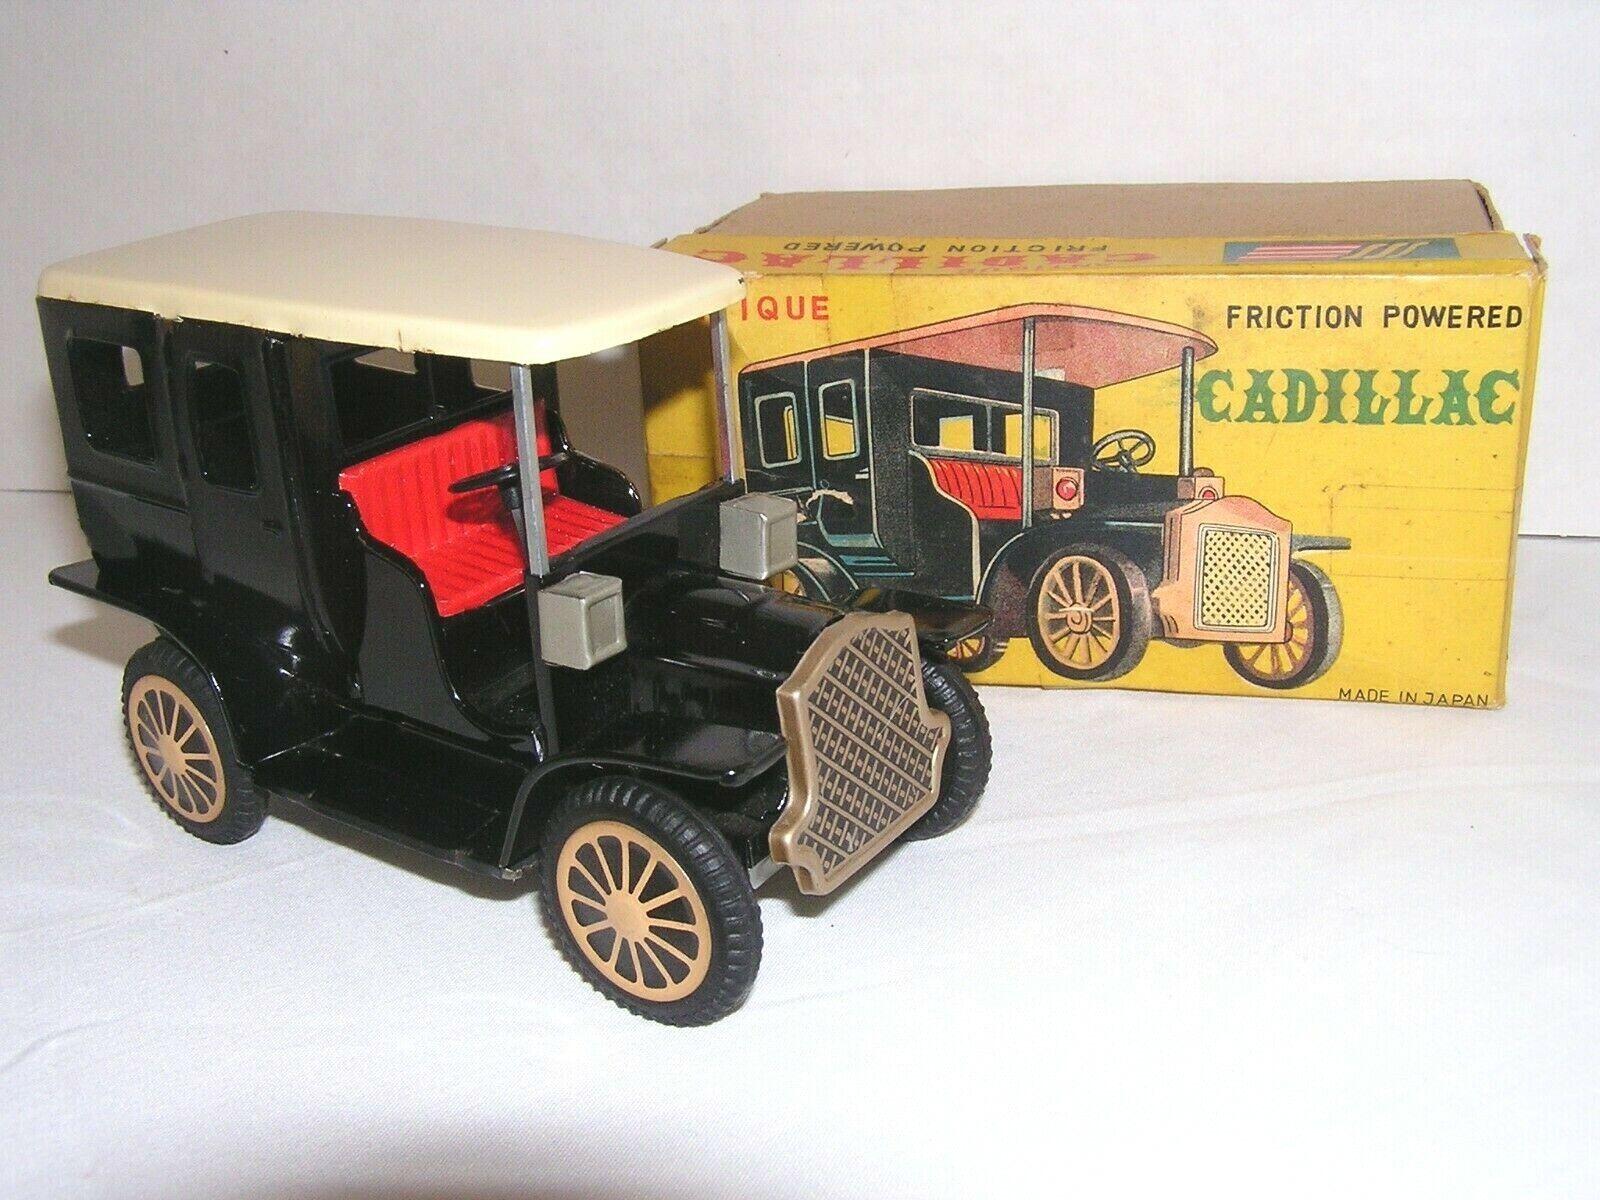 Antiguo Cadillac Negro Lata Litografiada Fricción Coche De Juguete Vintage Shioji Sss Japón Sin usar, en Caja